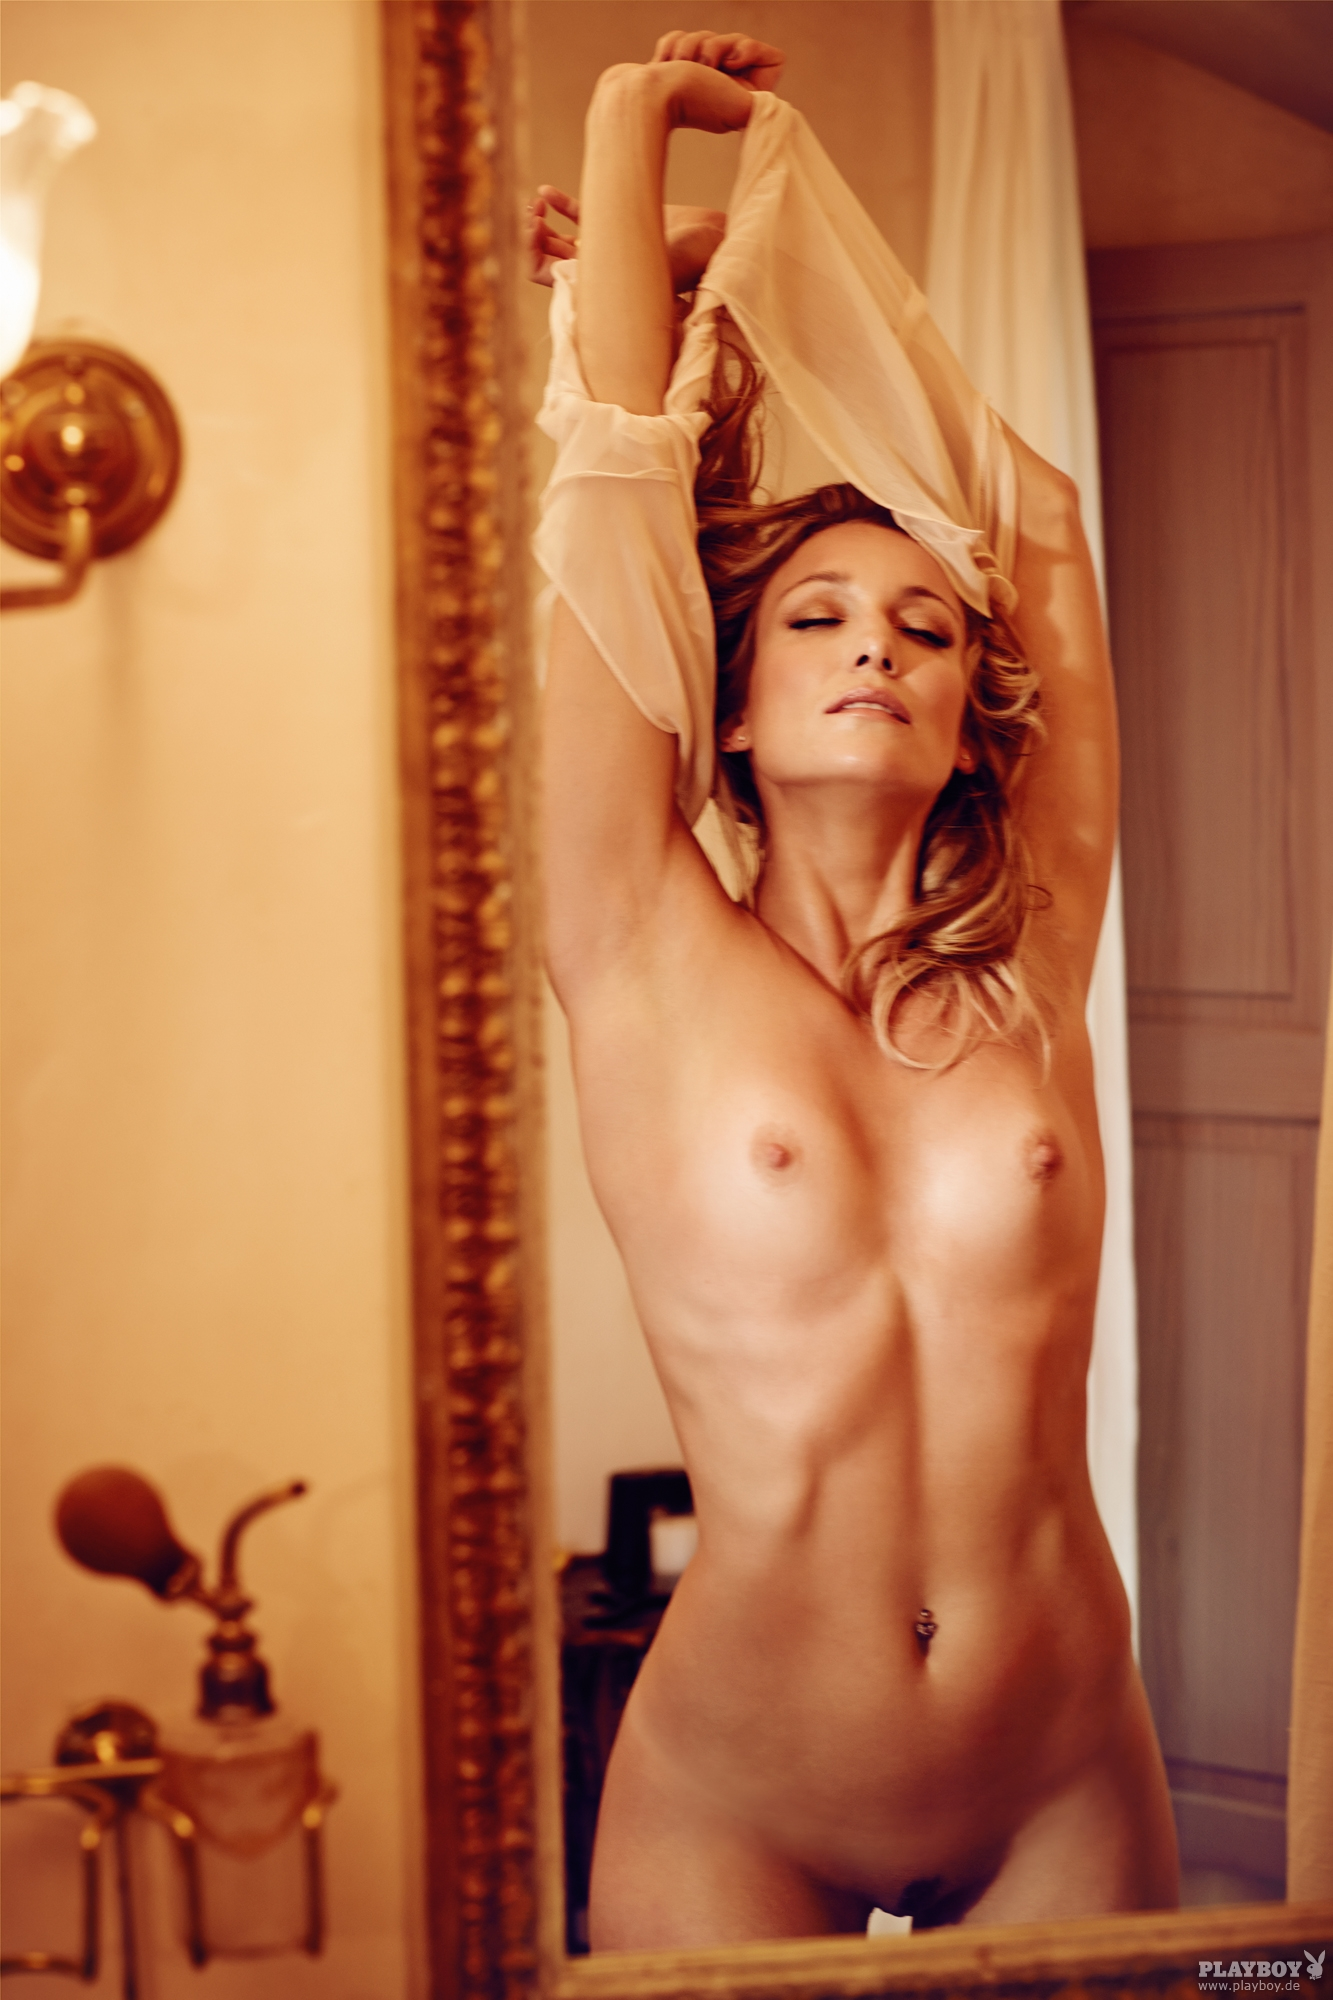 Кристин Тэйсс голая. Фото - 30